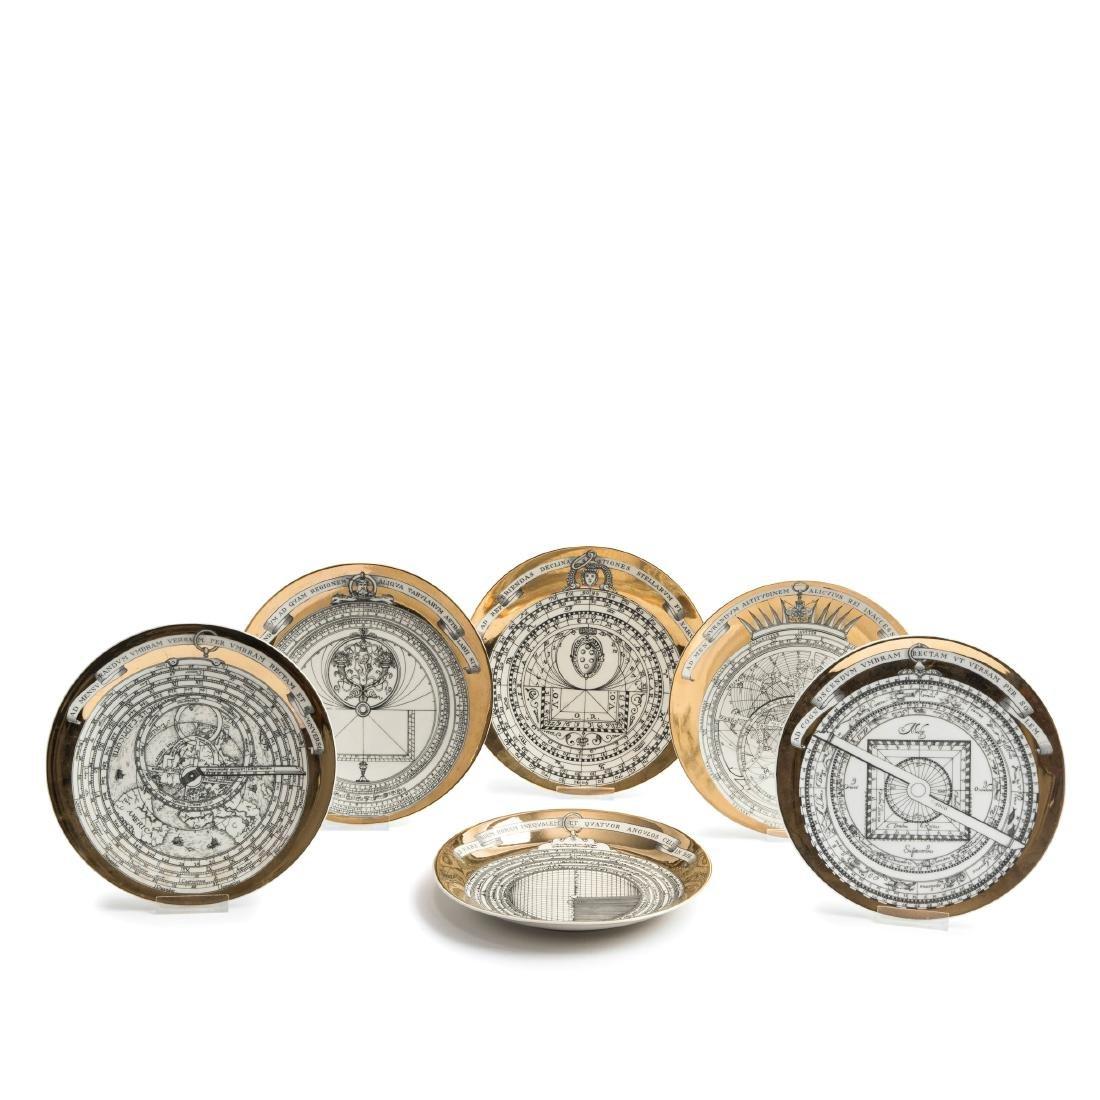 Six 'Astrolabio' plates, 1965